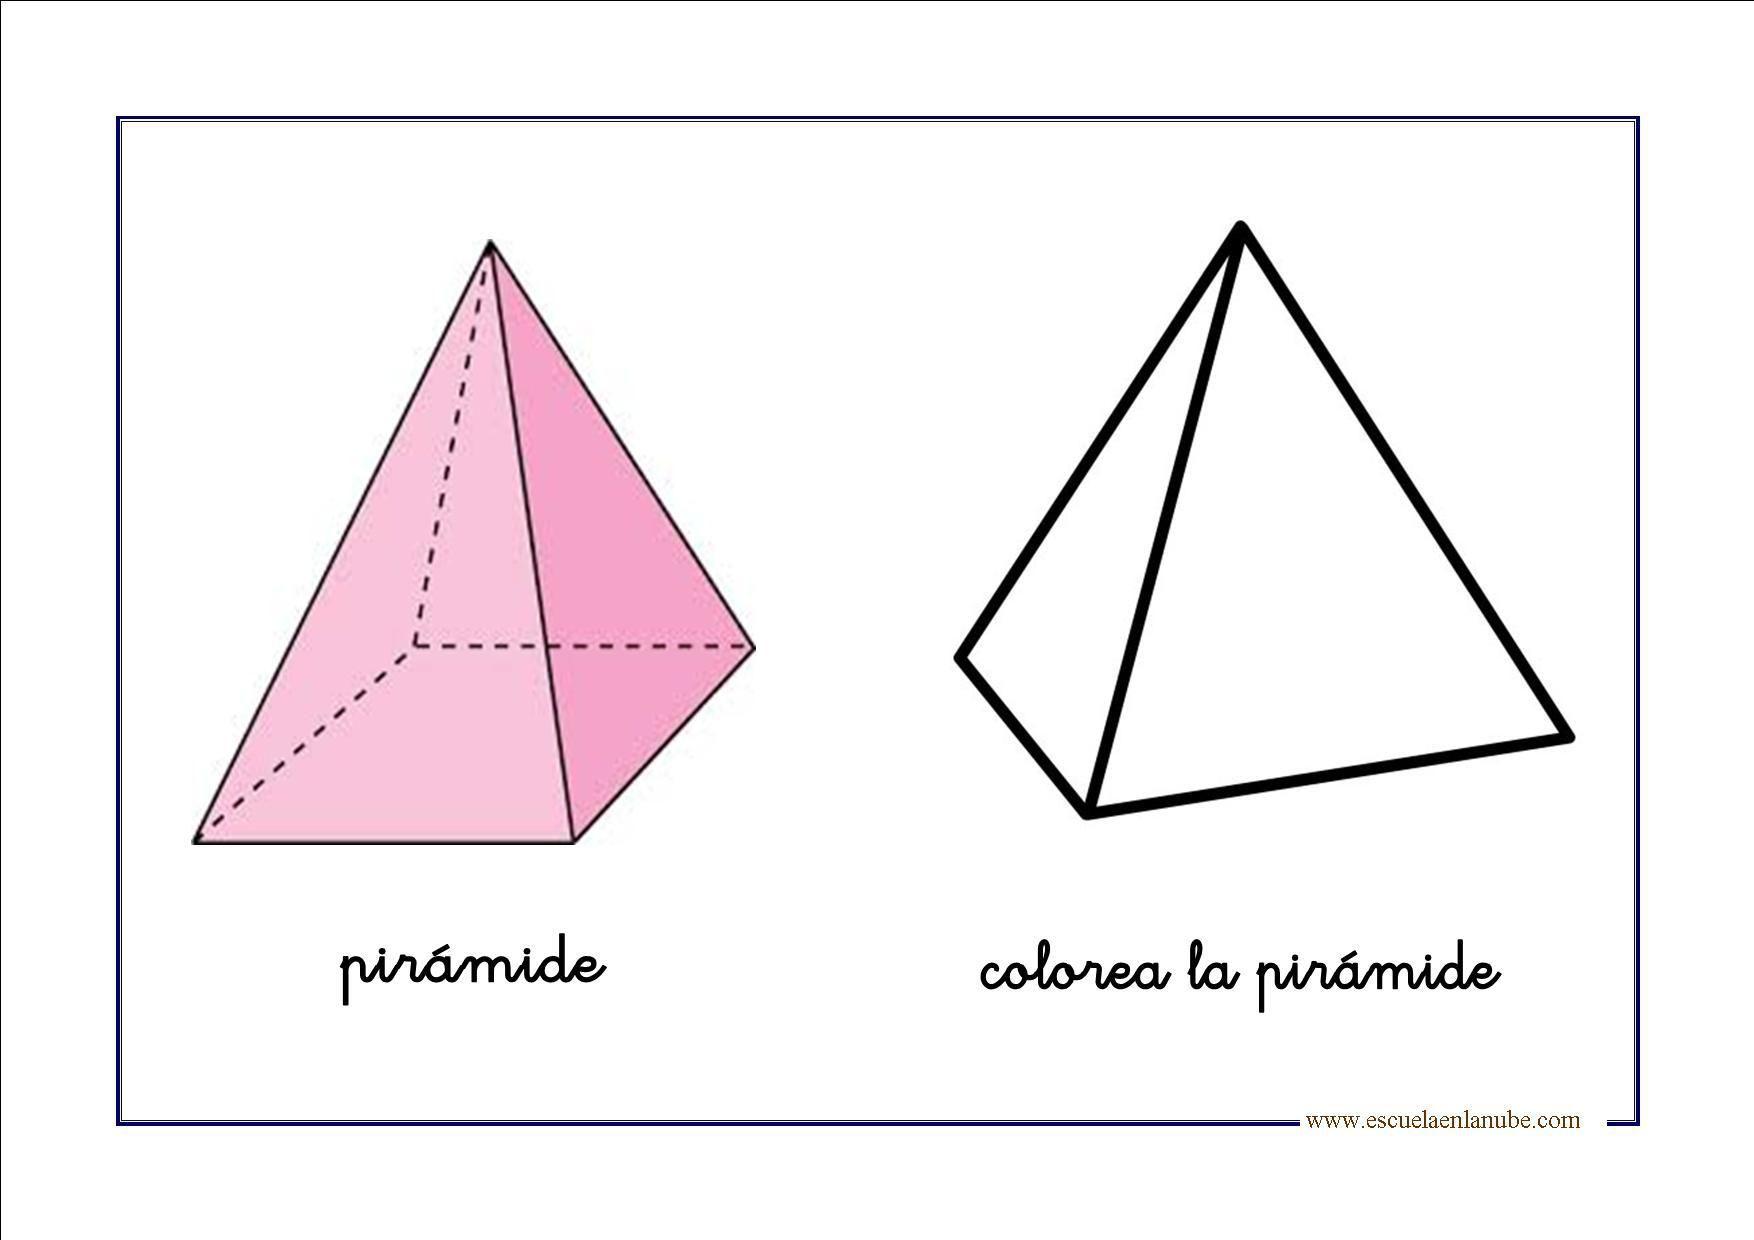 Figuras Geometricas Piramide 1 754 1 240 Pixeles